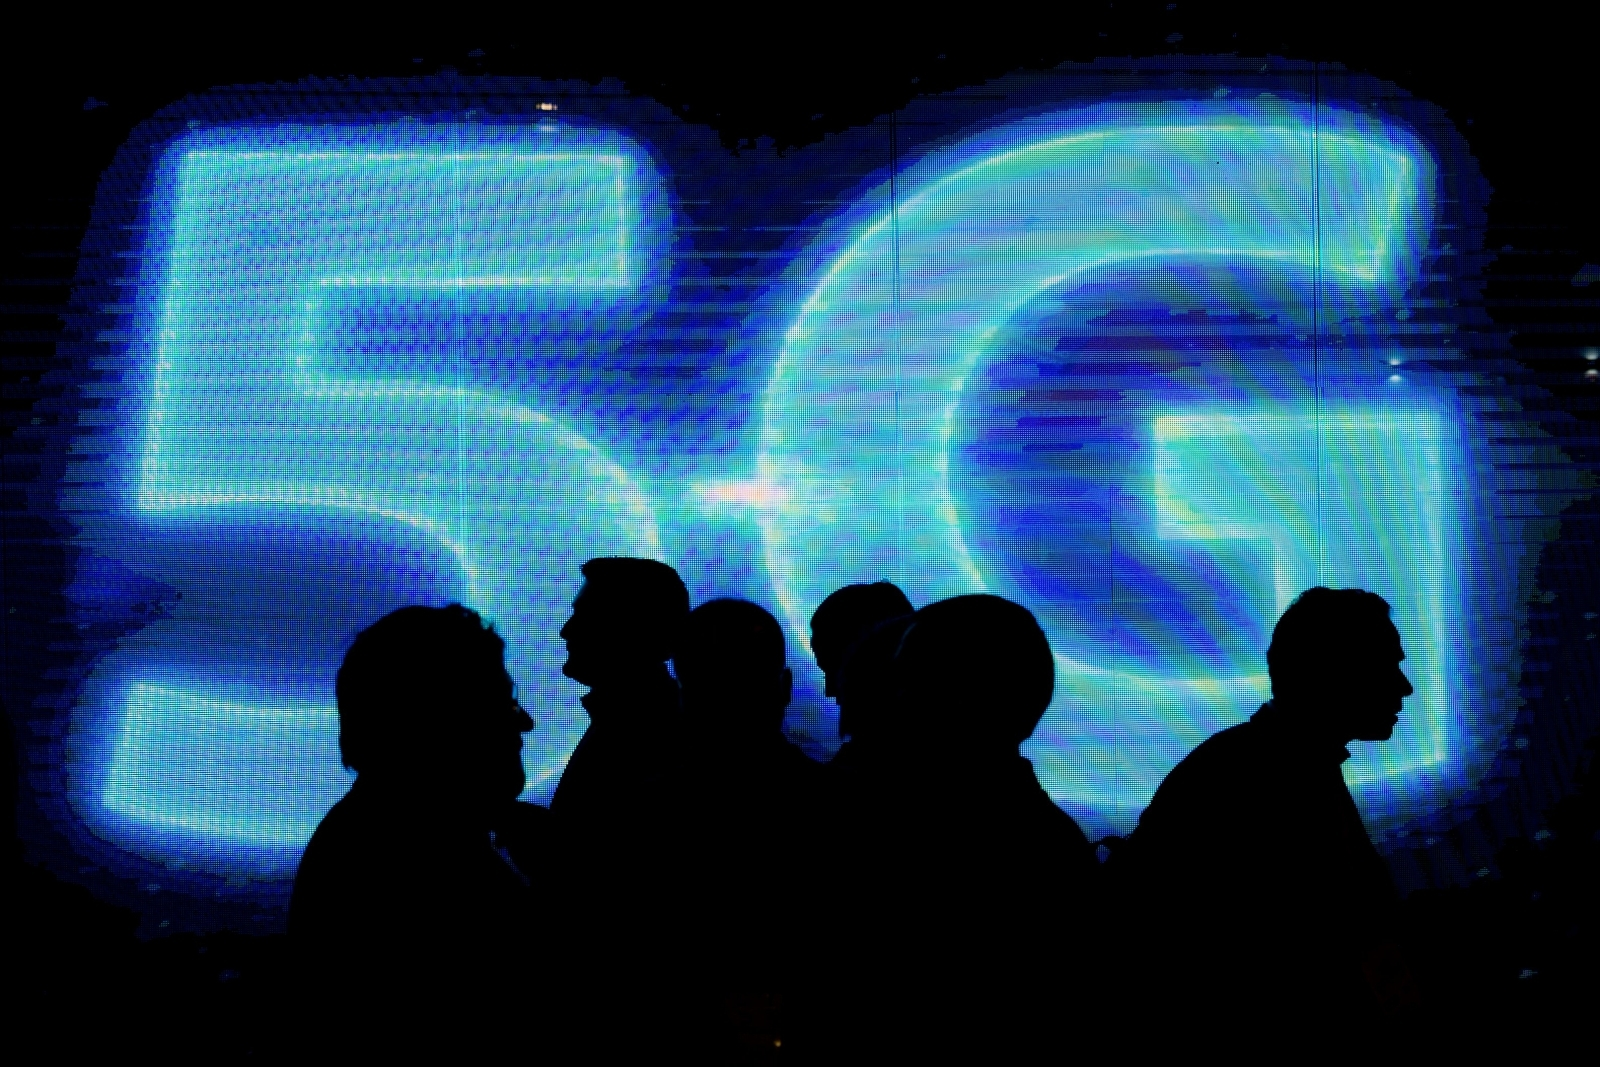 High speed internet